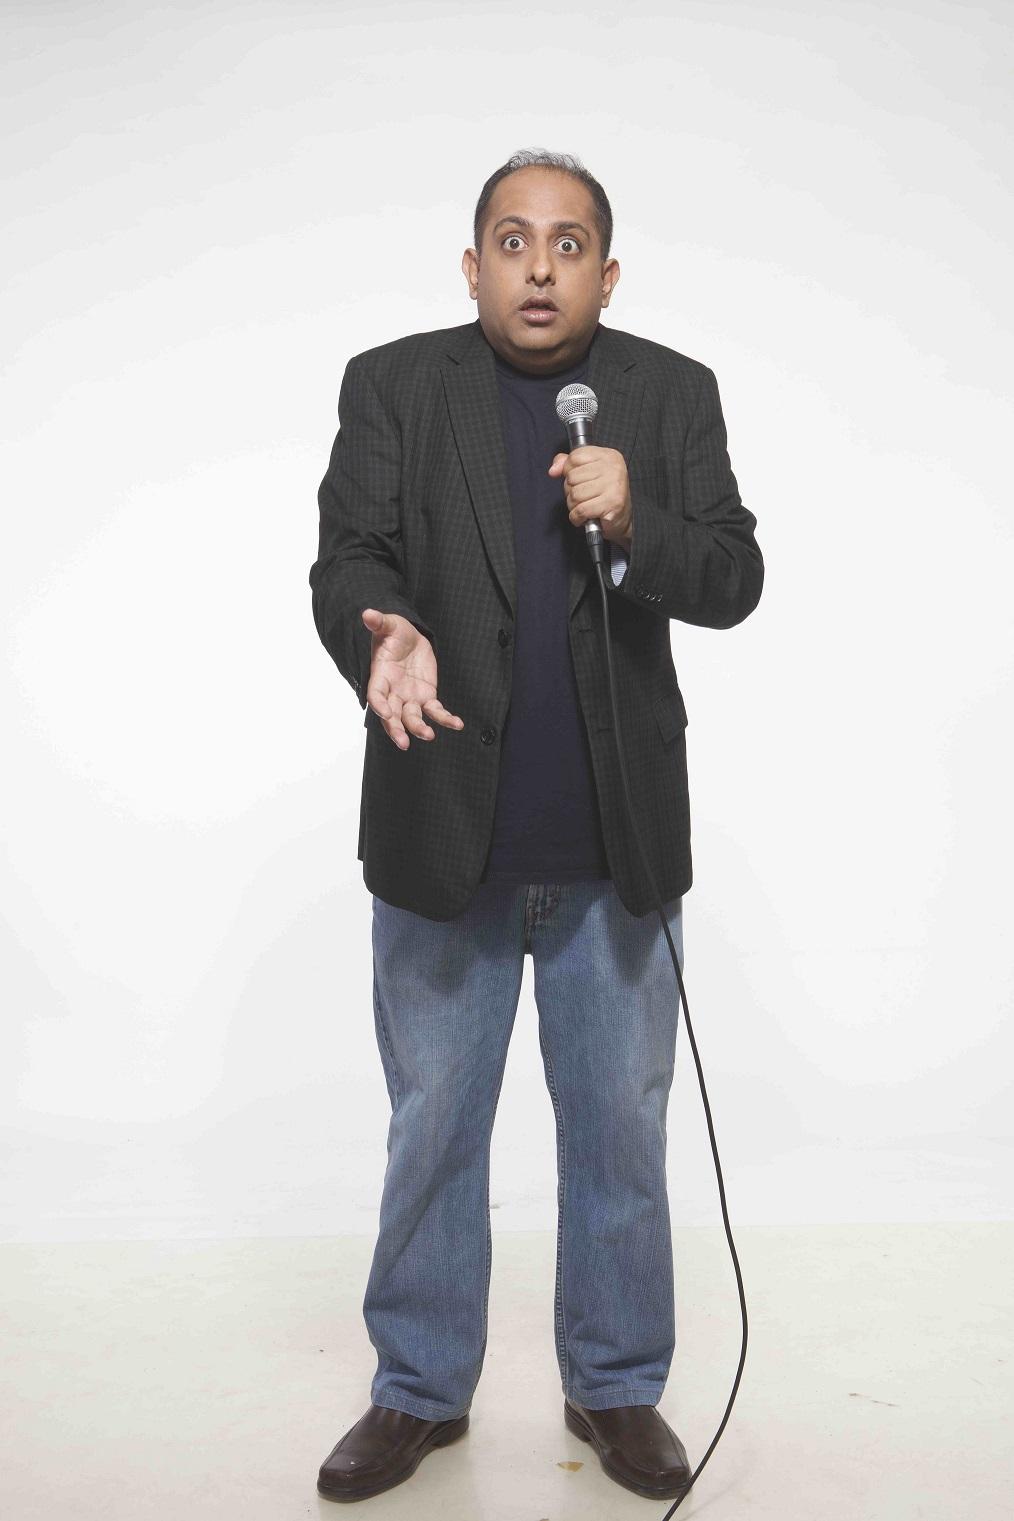 LAUGH OUT LOUD: Anubav Pal